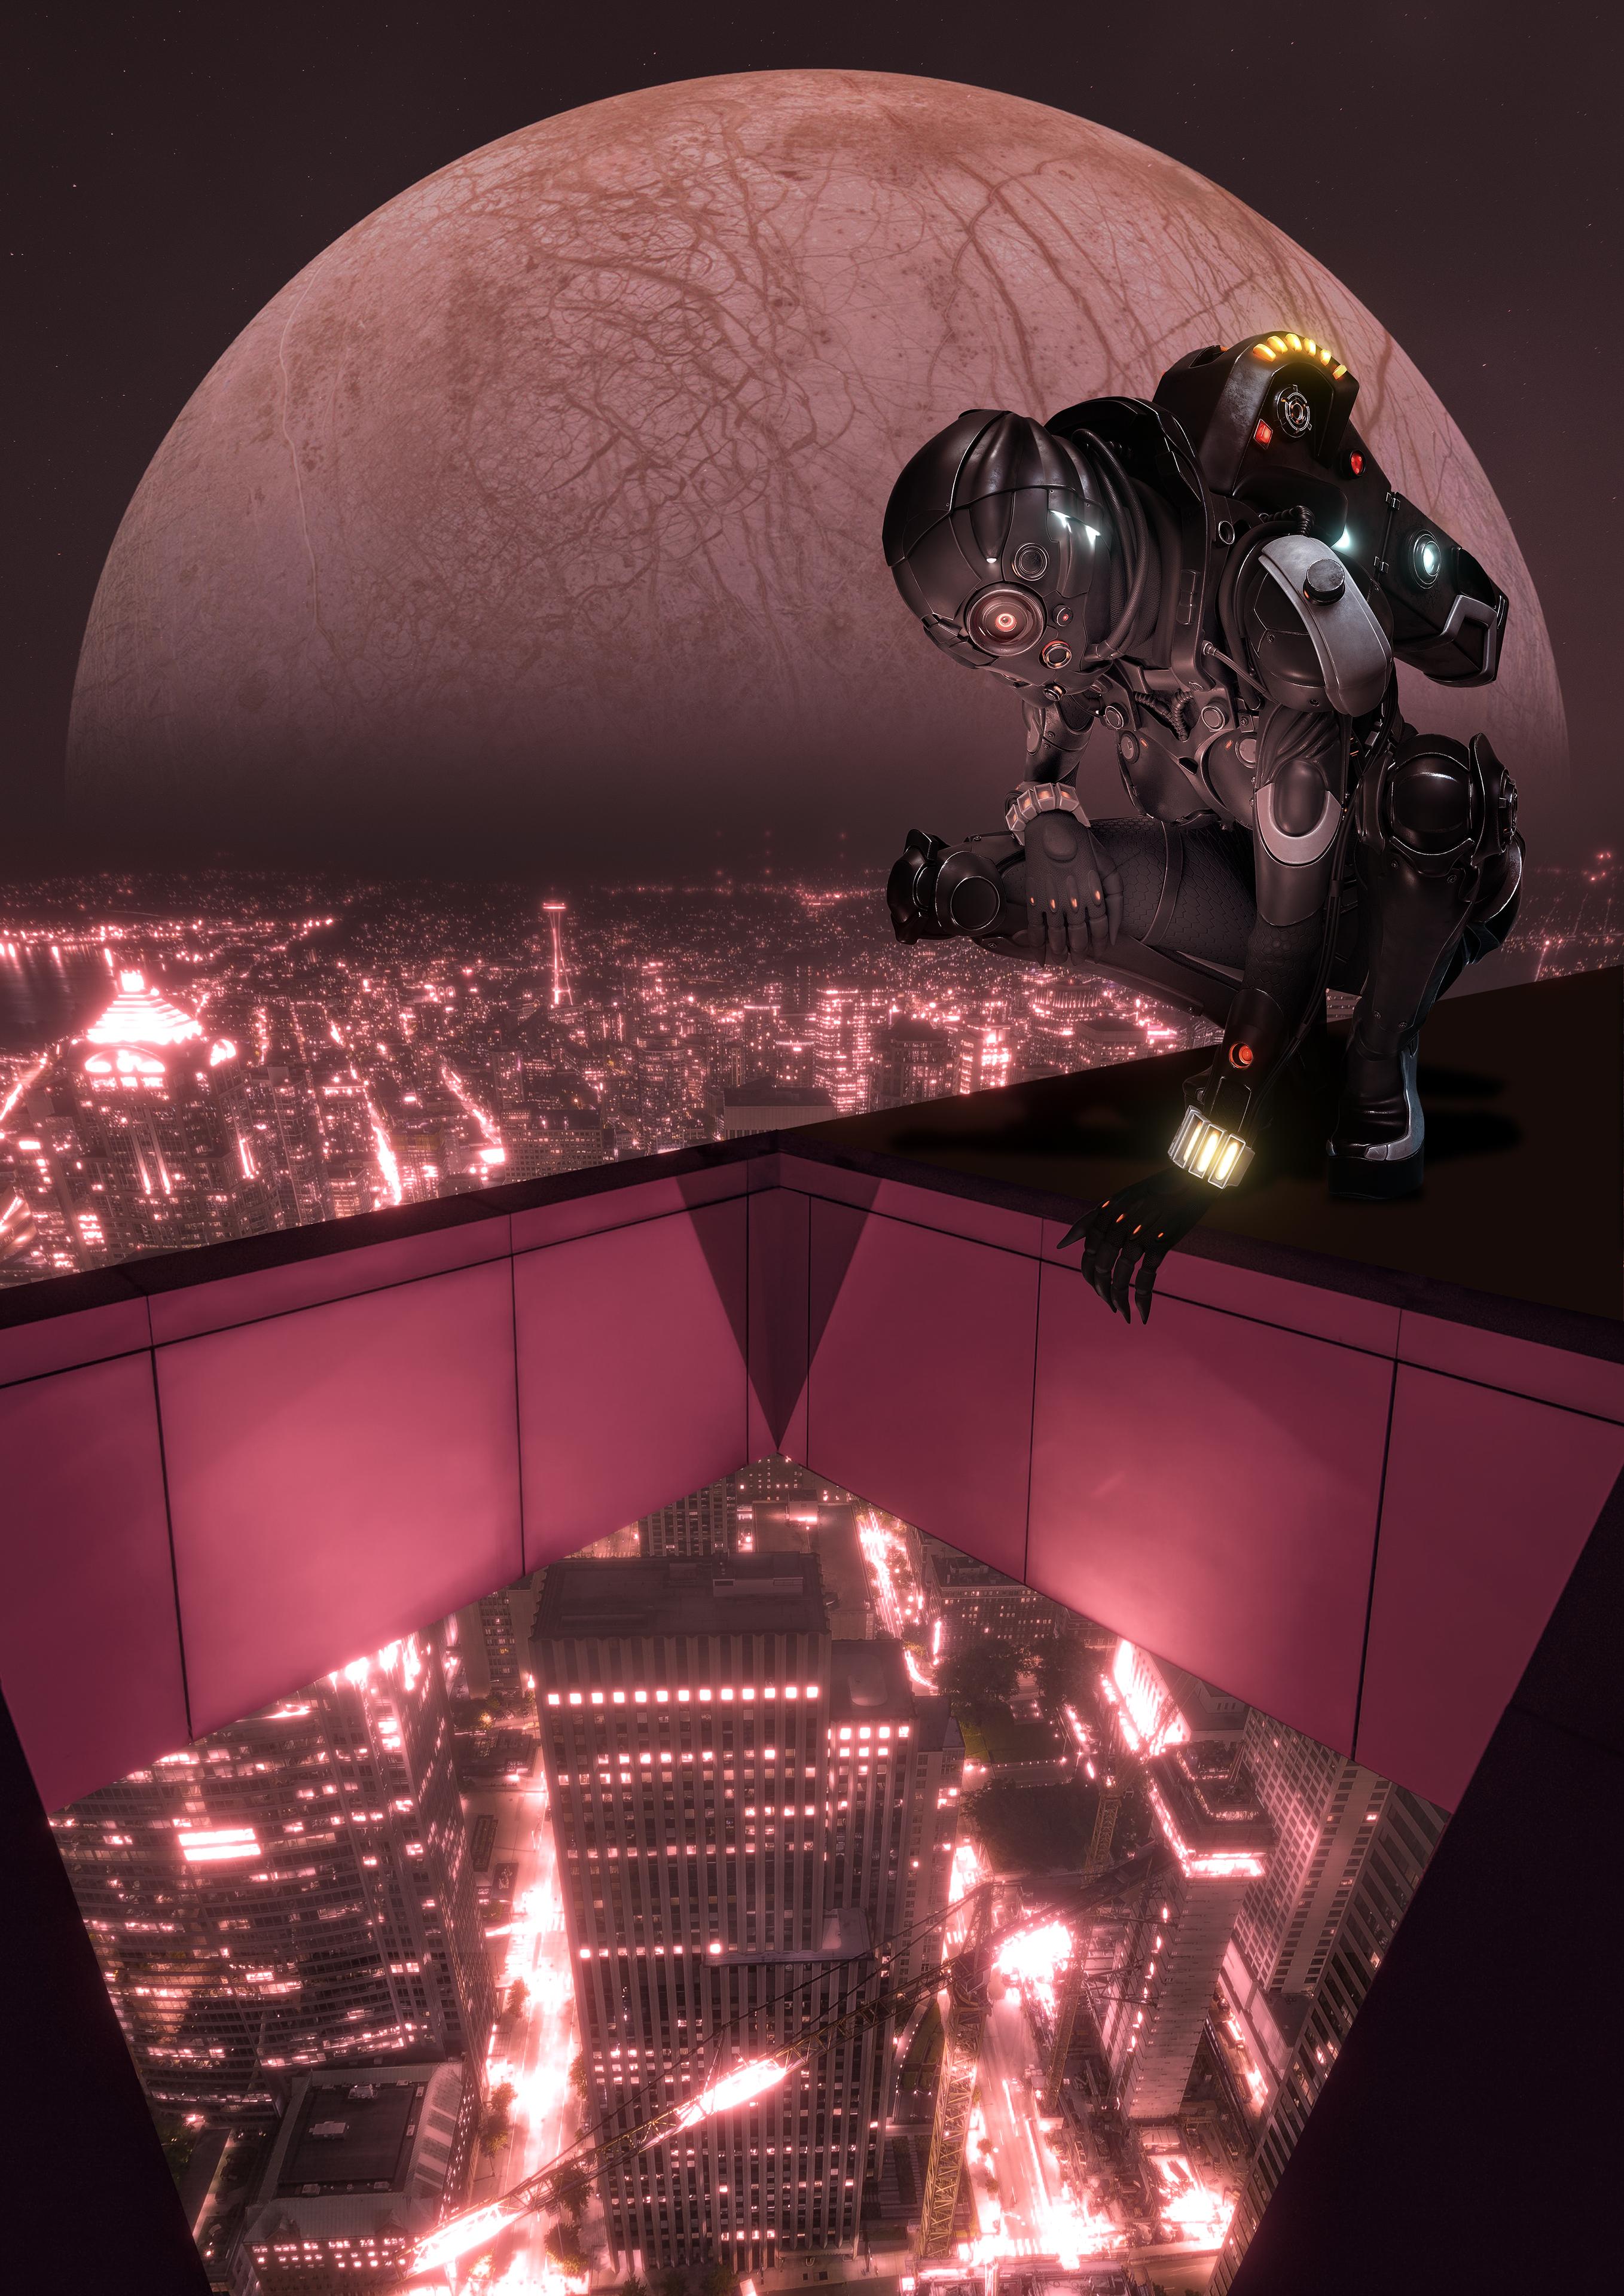 oniric cityglow composite - Create a Metropolis Glow With the Oniric Plugin